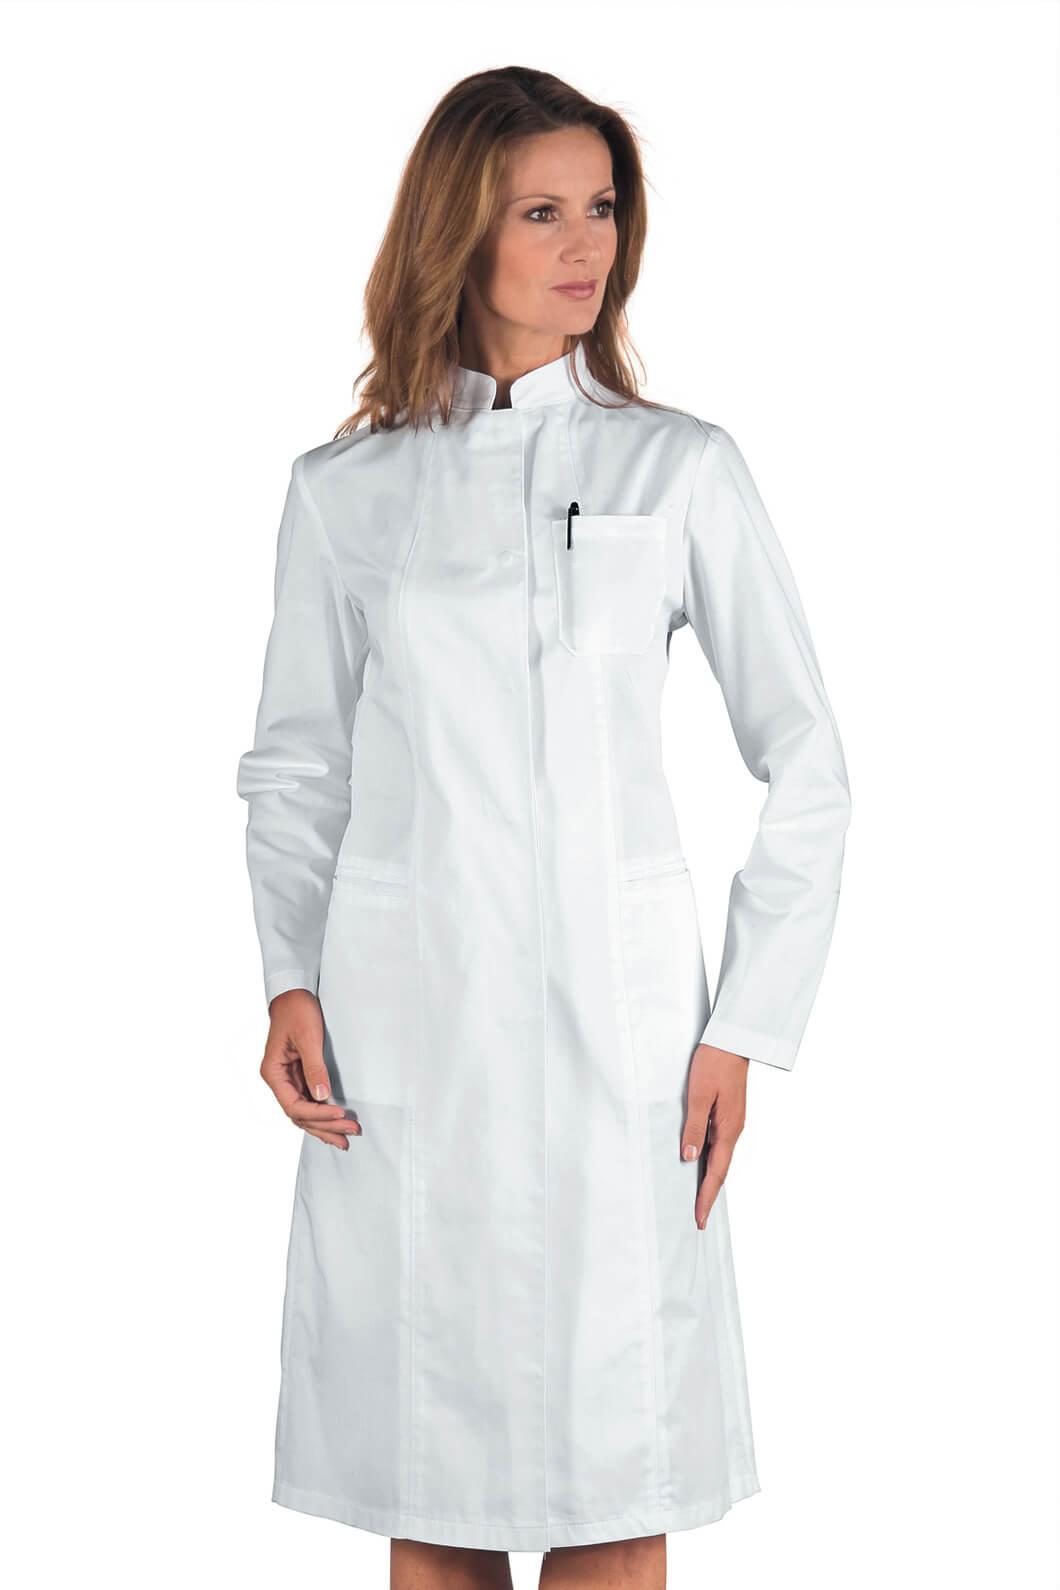 blouse m dicale blanche ponza. Black Bedroom Furniture Sets. Home Design Ideas